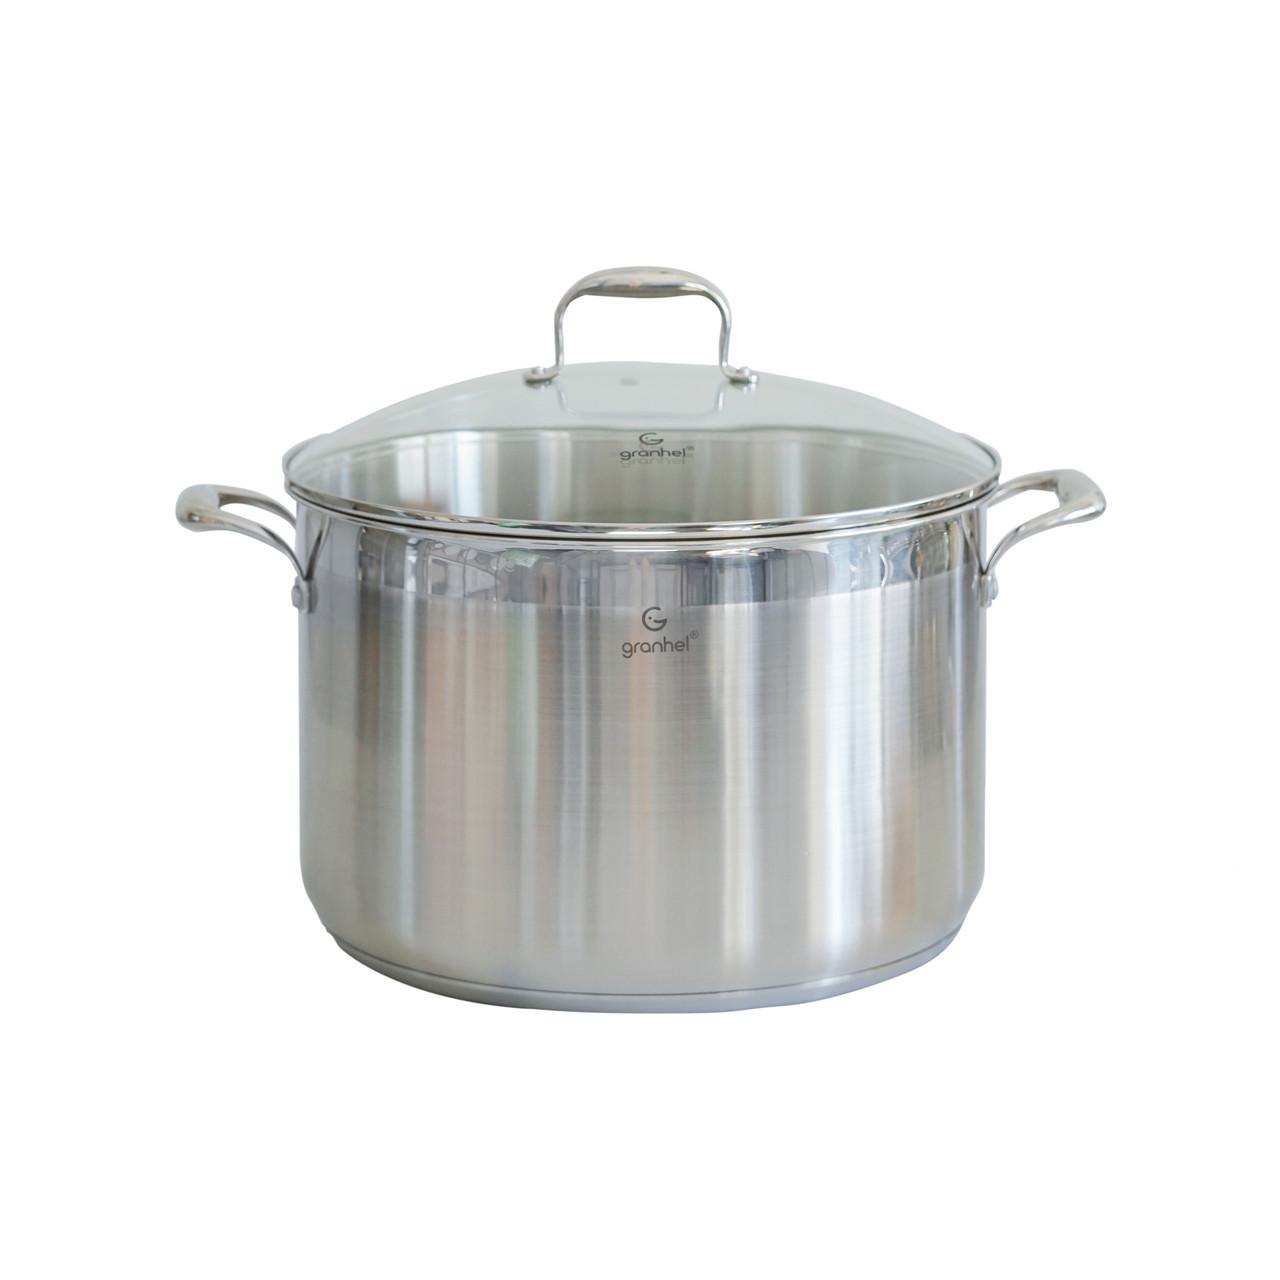 Кастрюля granhel Stainless steel 18/10 34х22,0 см 19,0 л